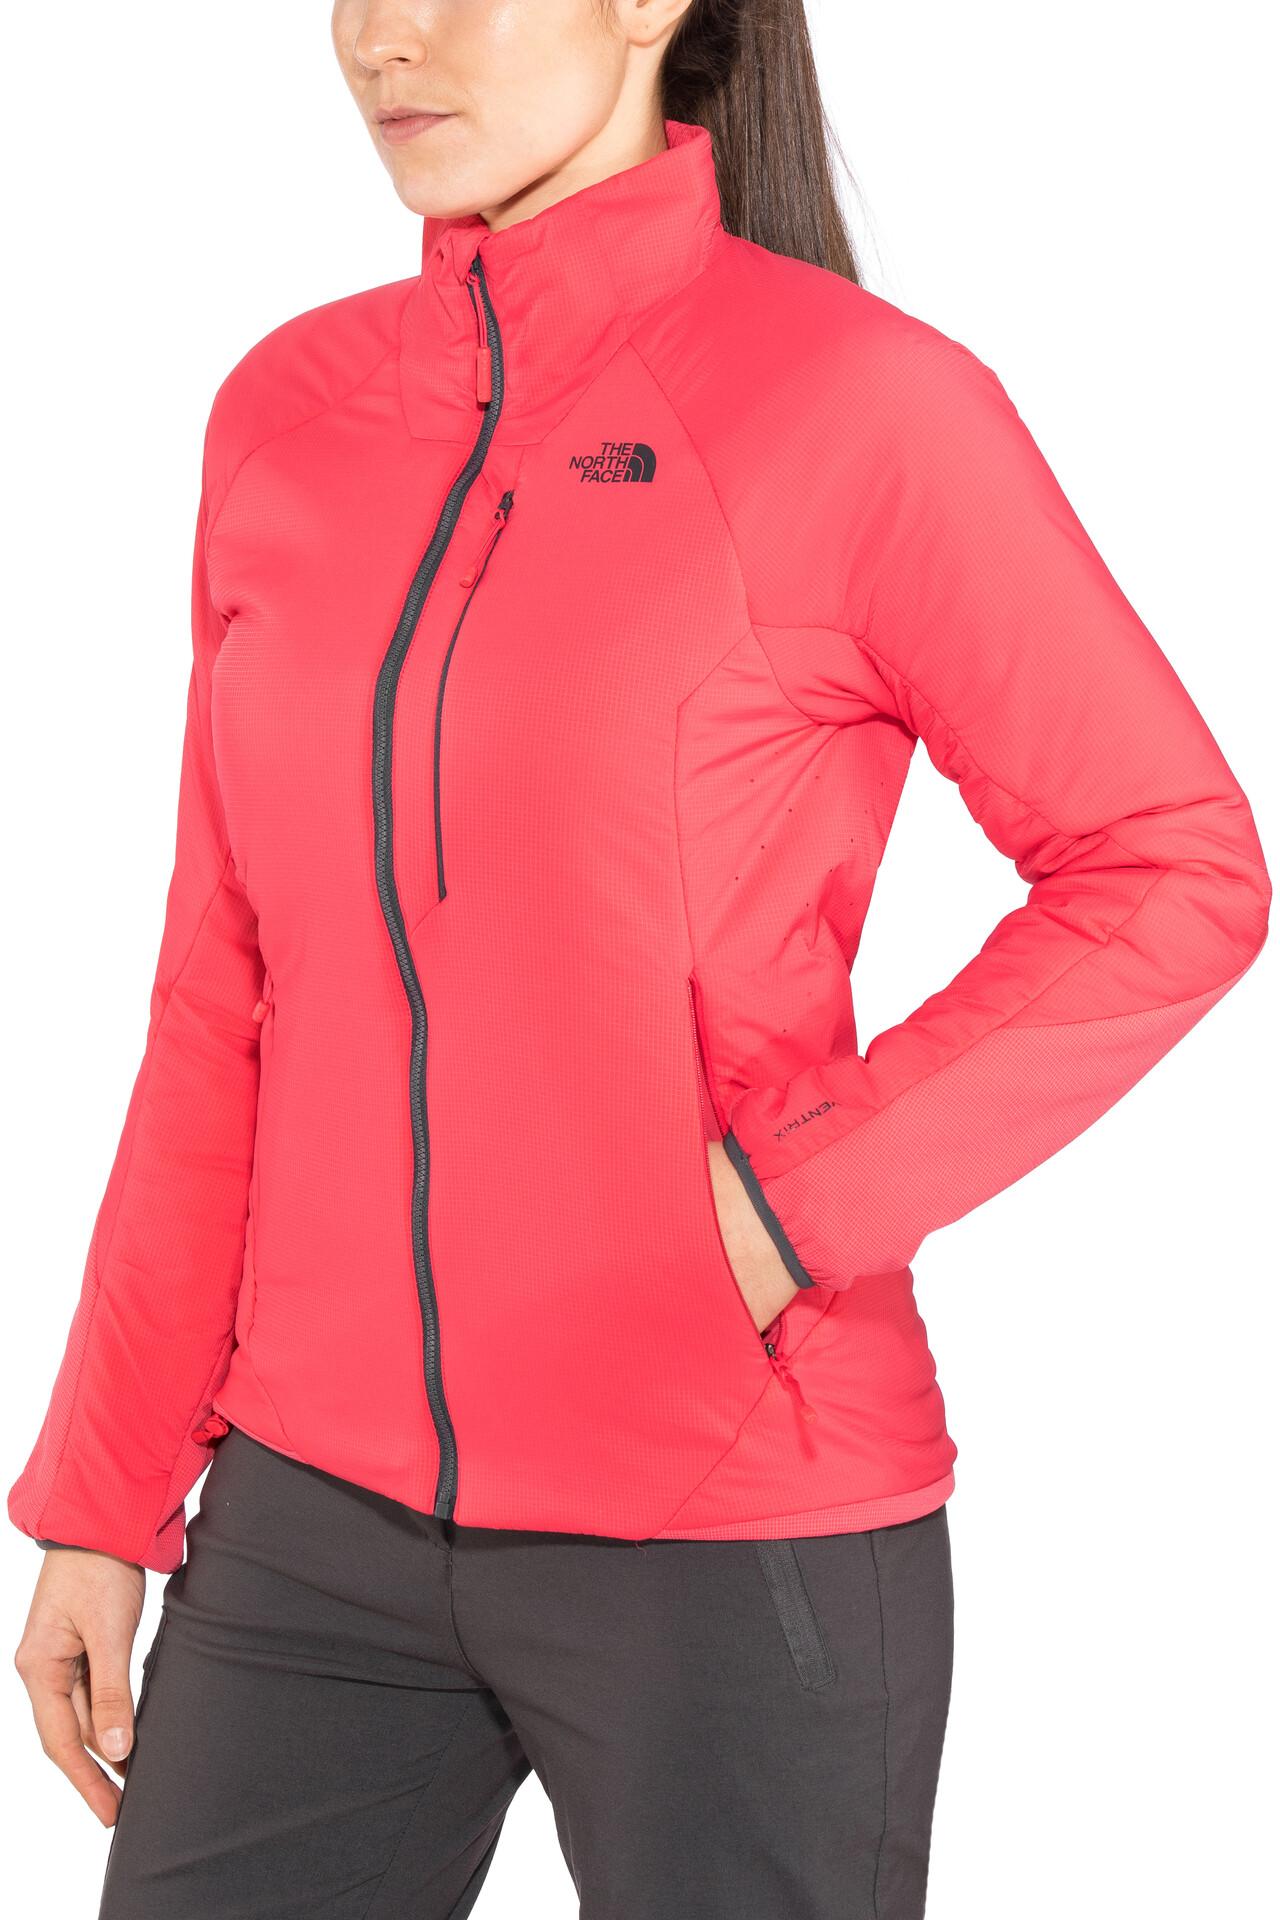 adidas TERREX Stockhorn Jakke Damer, active pink